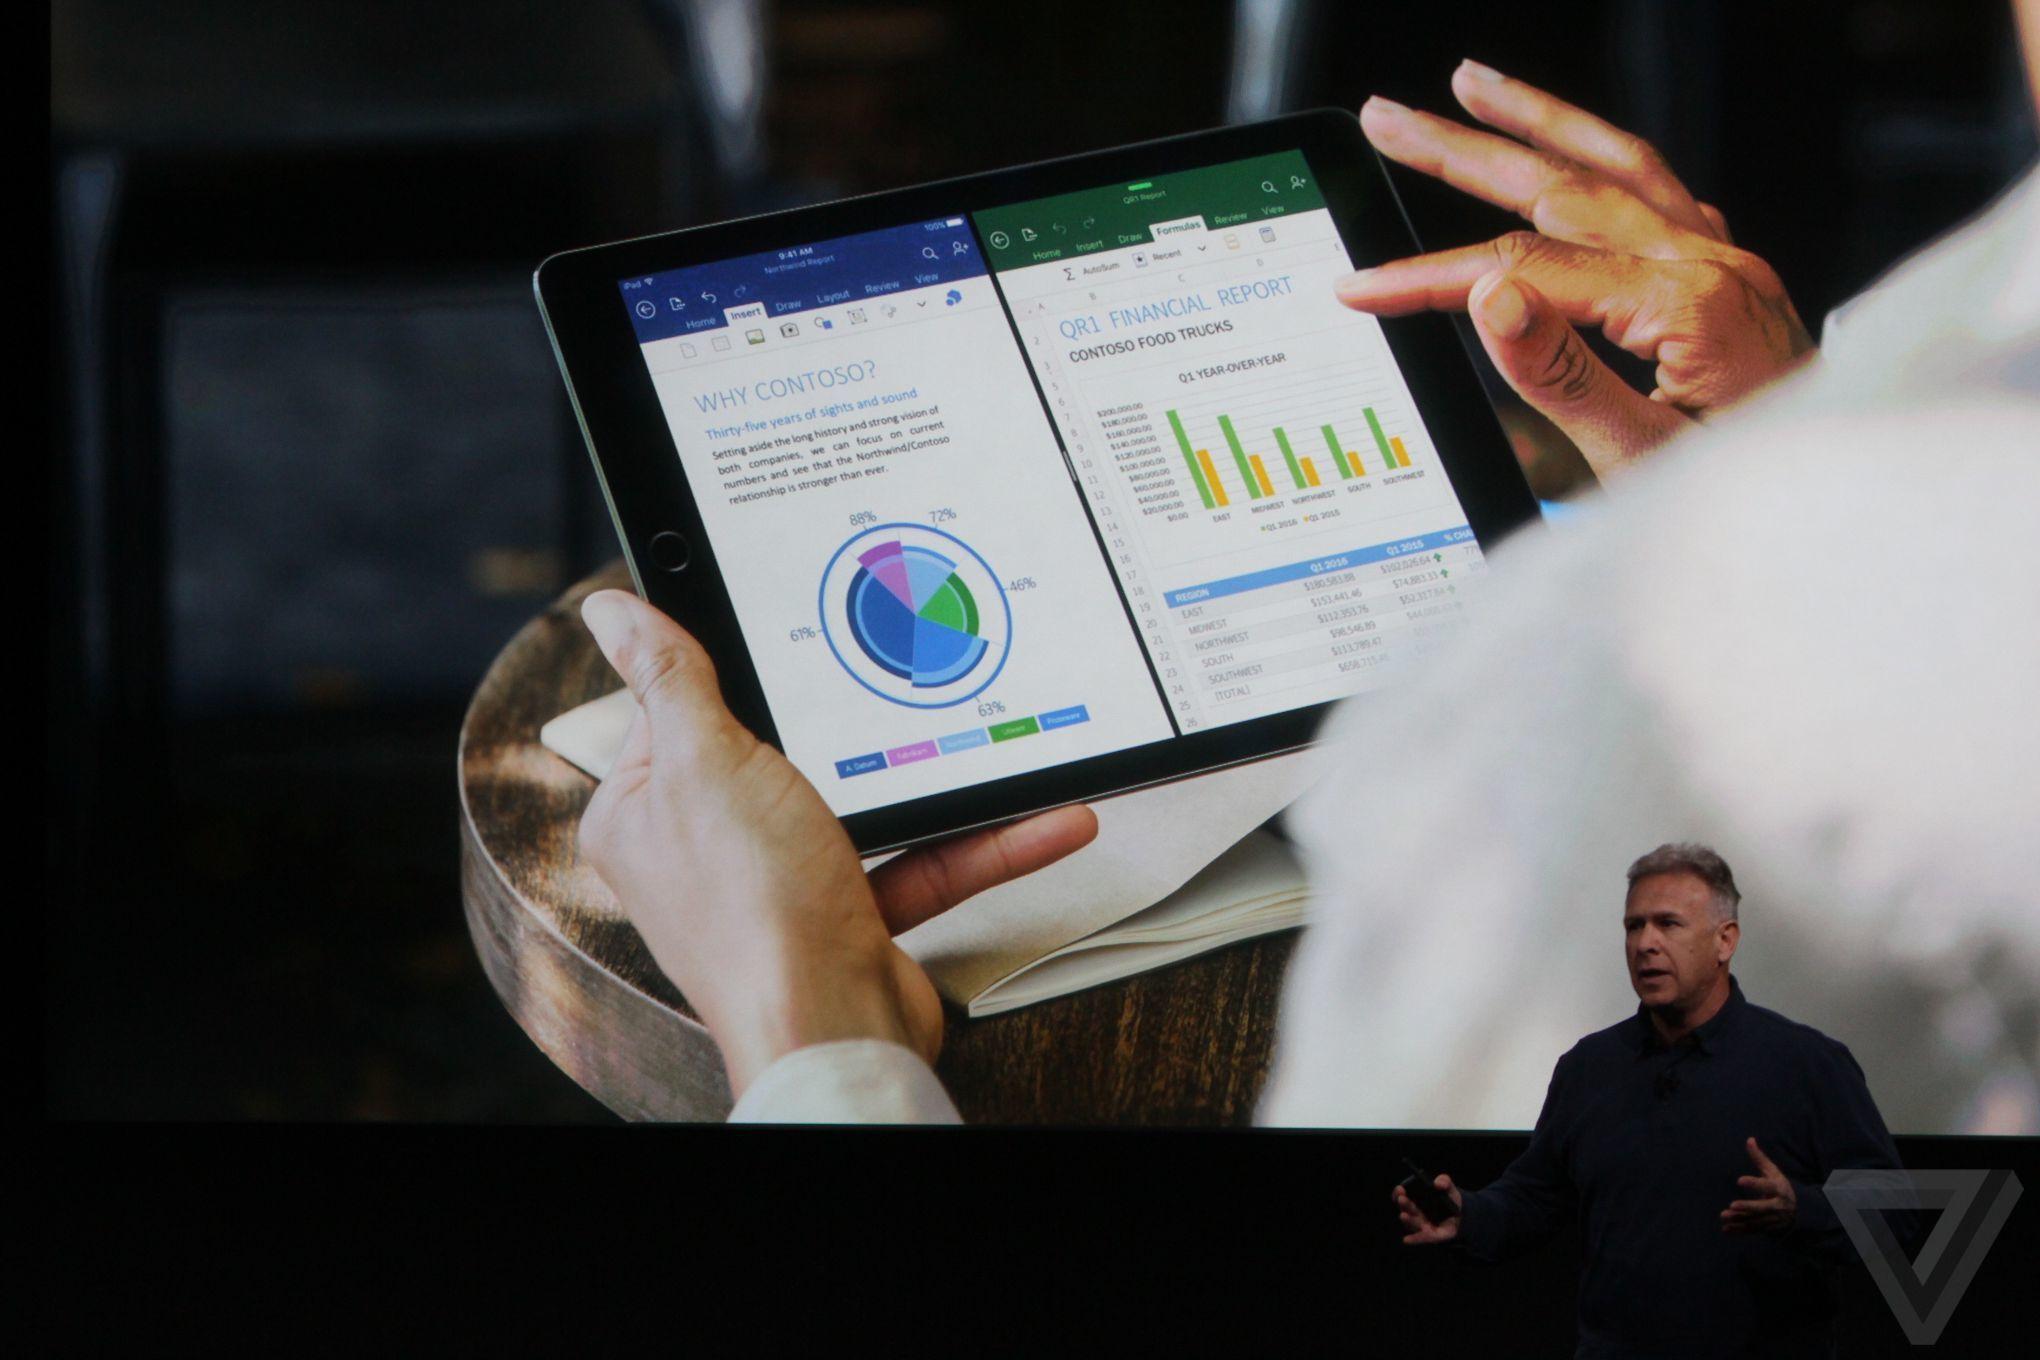 Apple 9.7-inch iPad Pro announcement photos